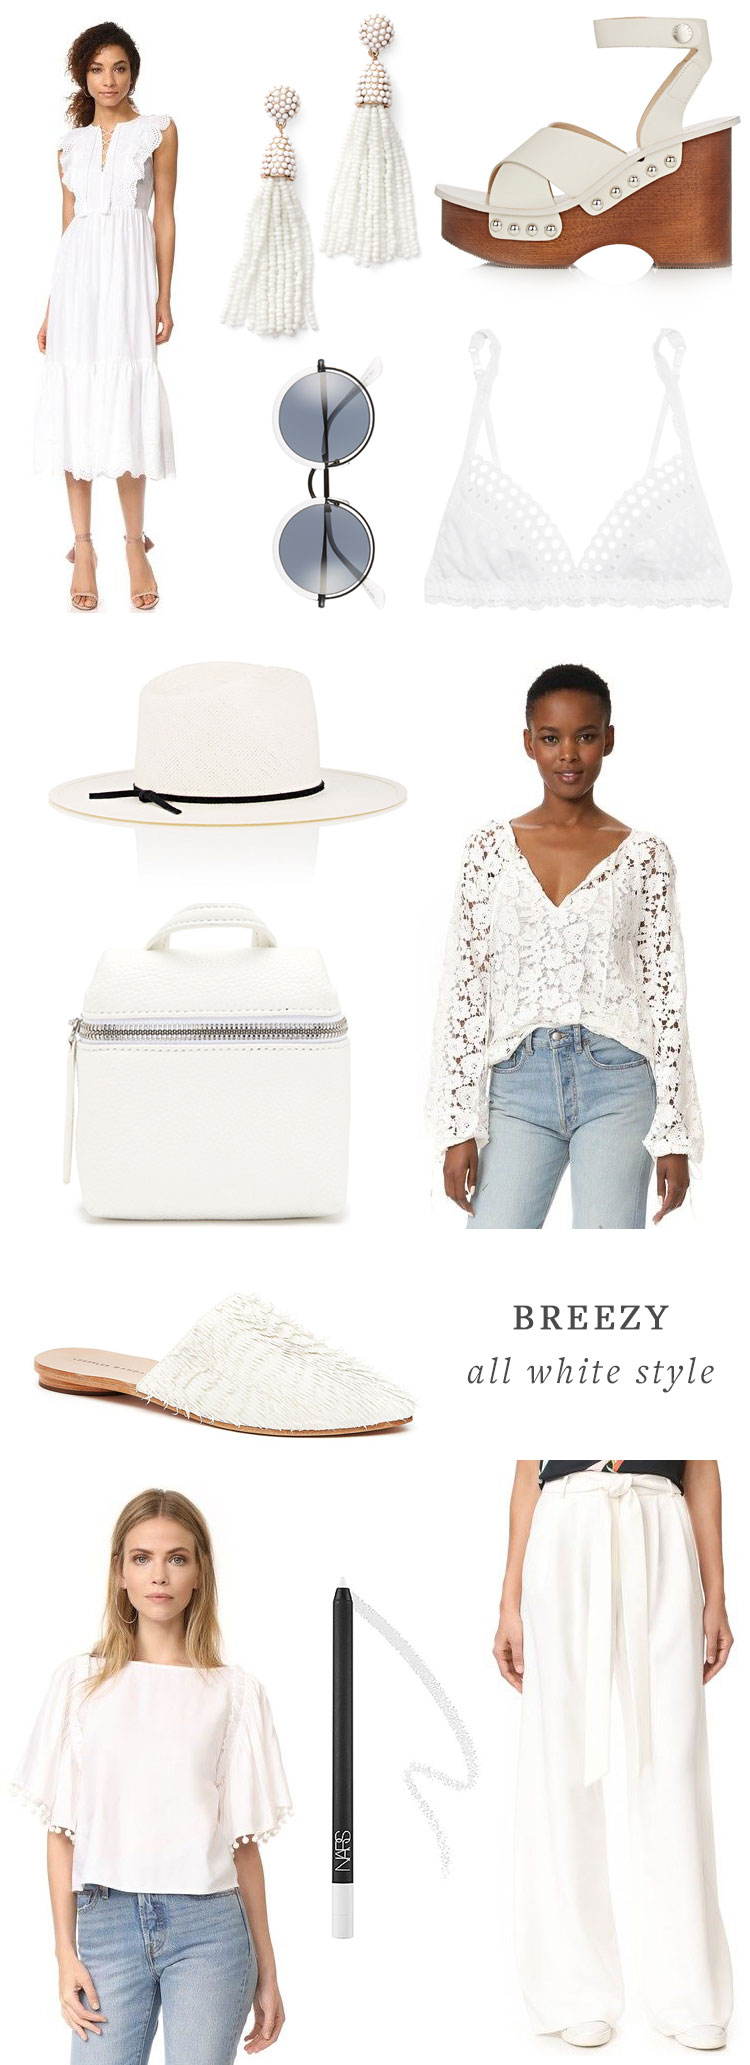 get the look: all white fashion staples for summer via jojotastic on jojotastic.com